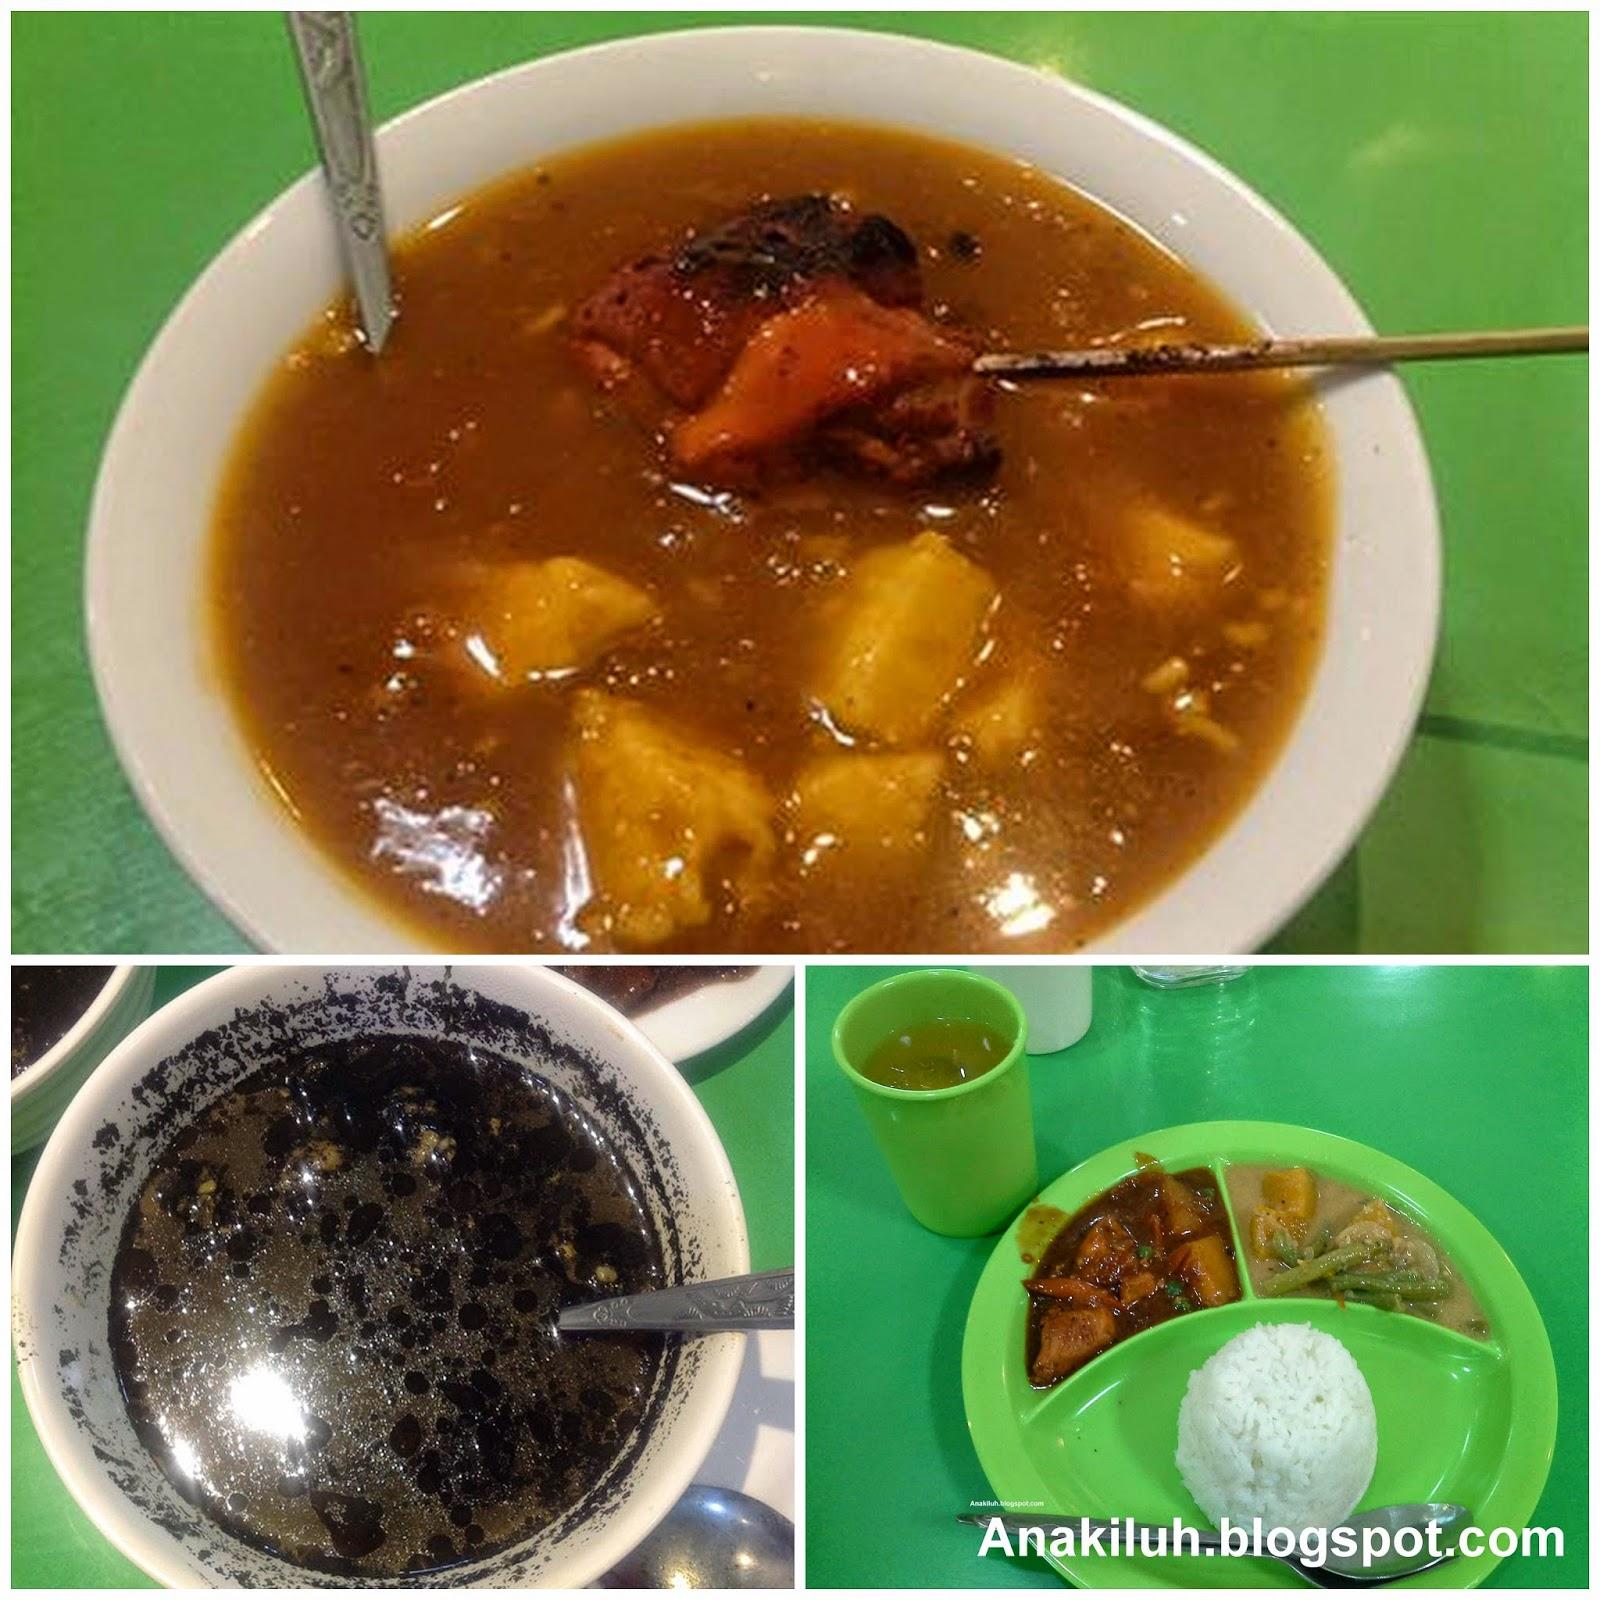 delicious food Tausug satti tiyula itum